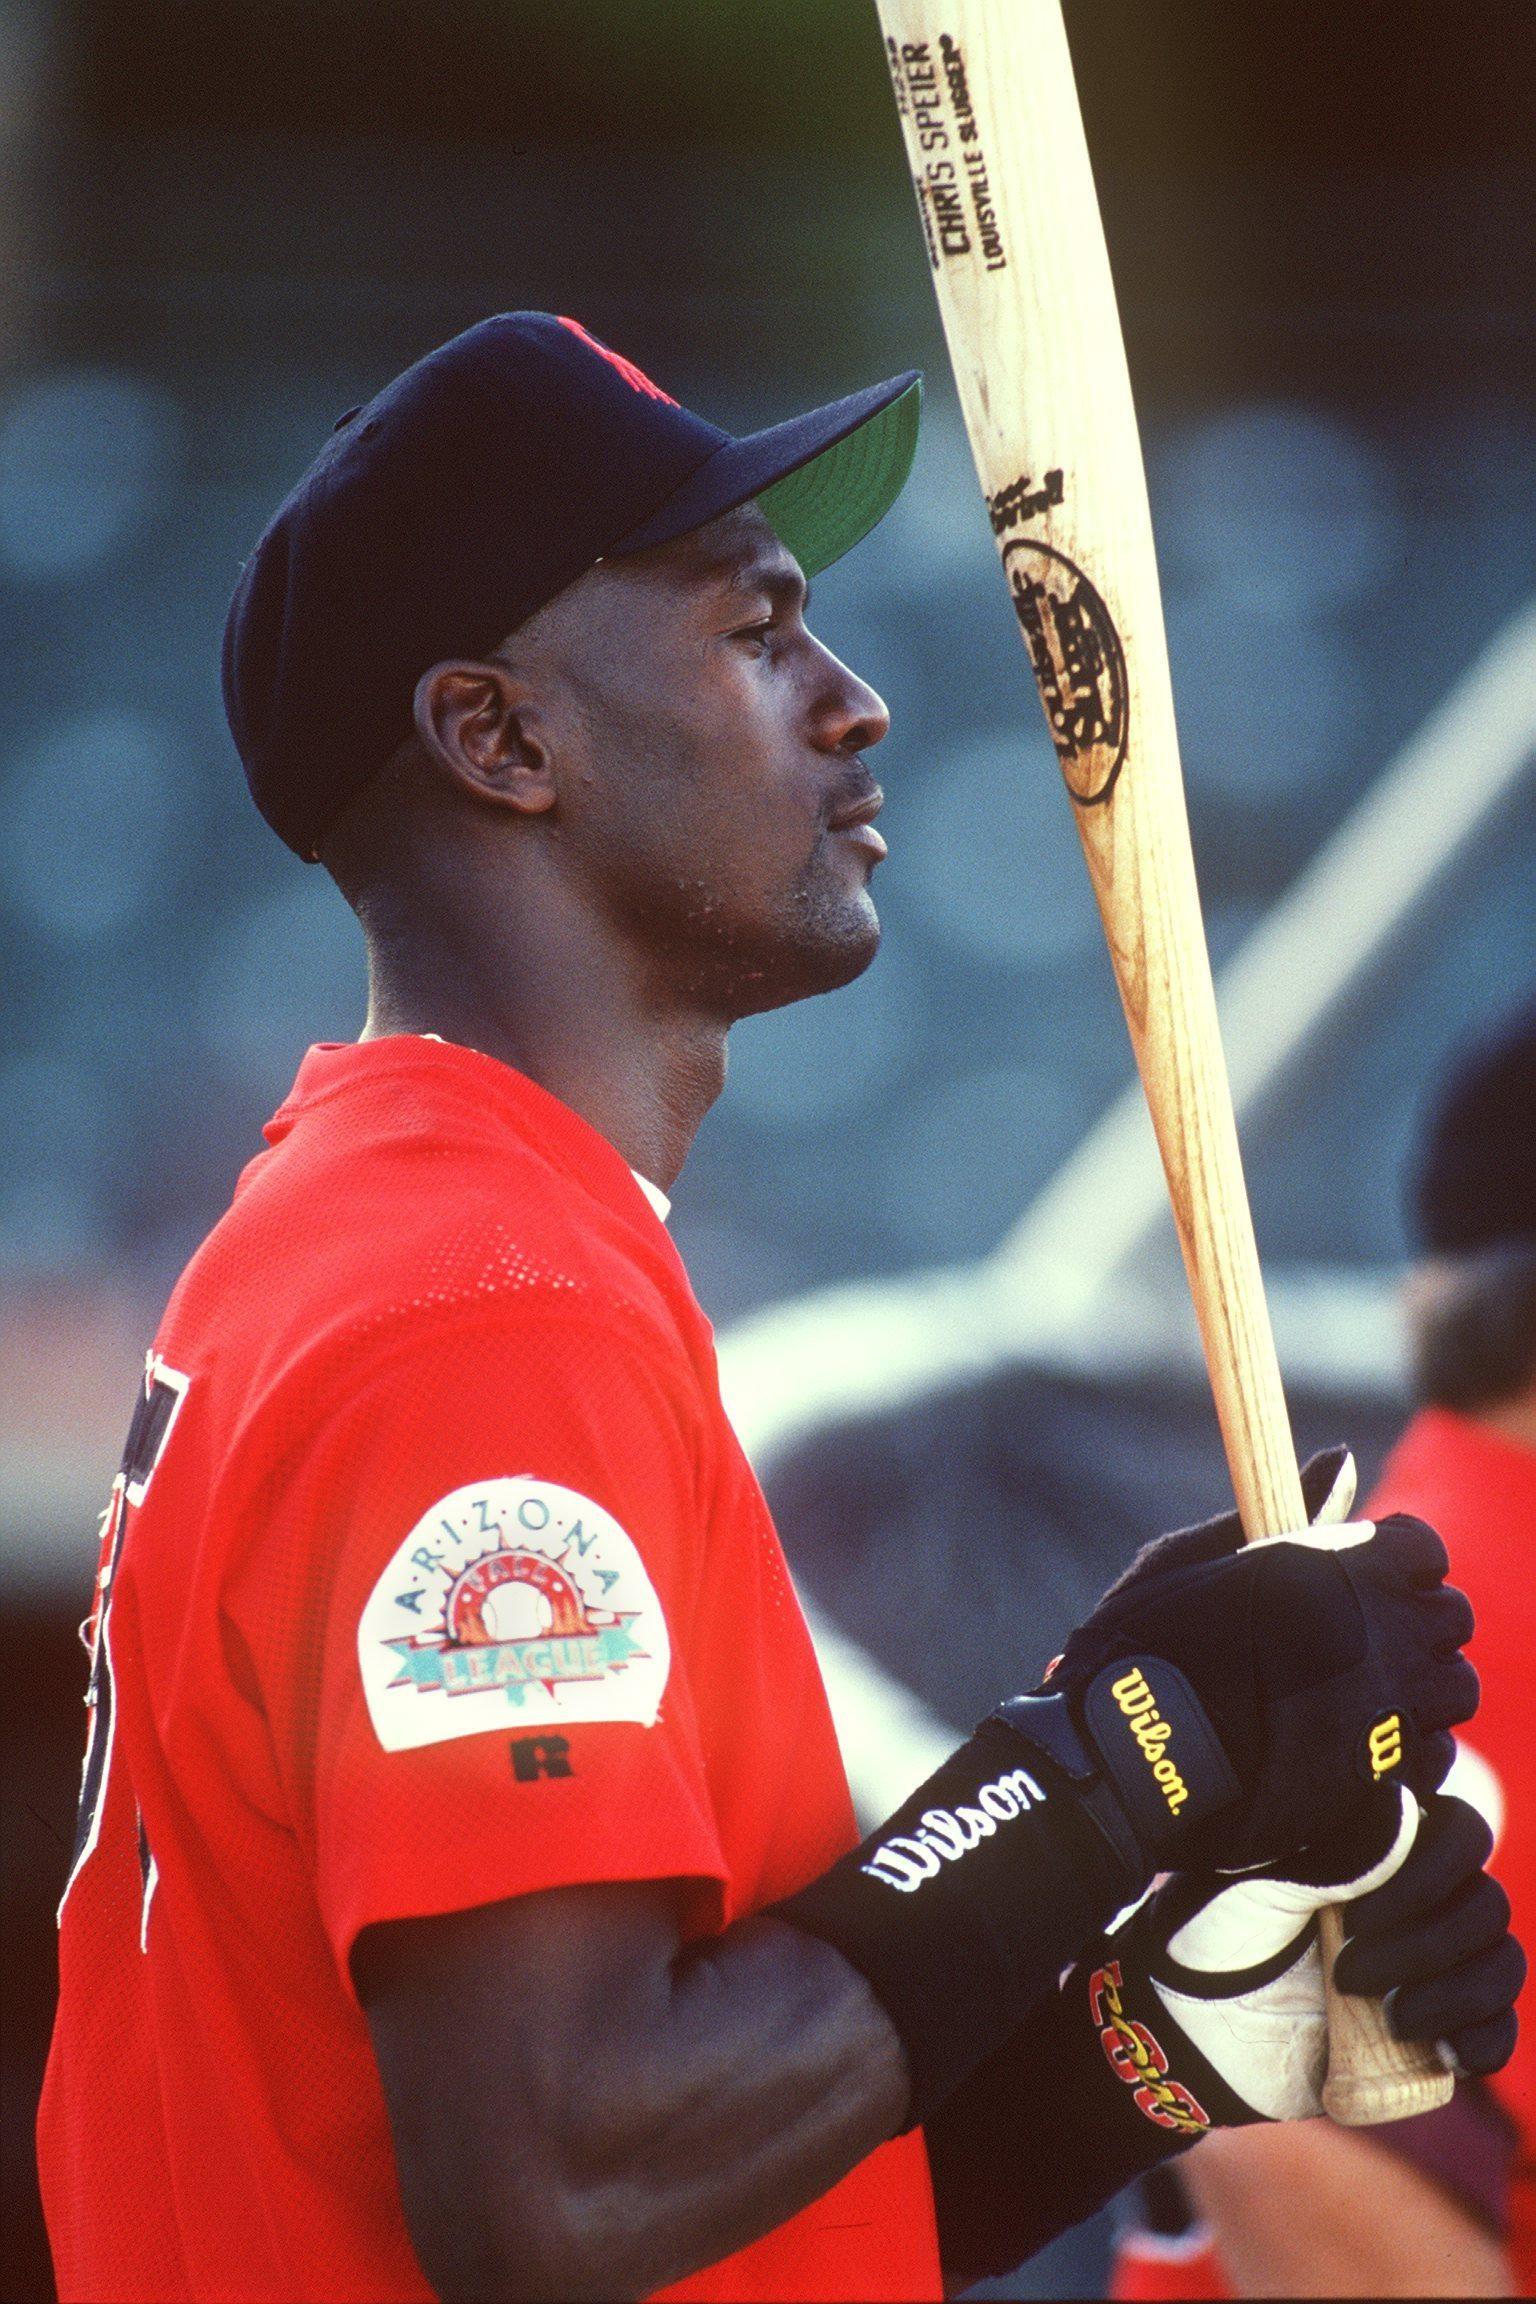 Michael Jordan S Baseball Career Michael Jordan Baseball Michael Jordan Michael Jordon